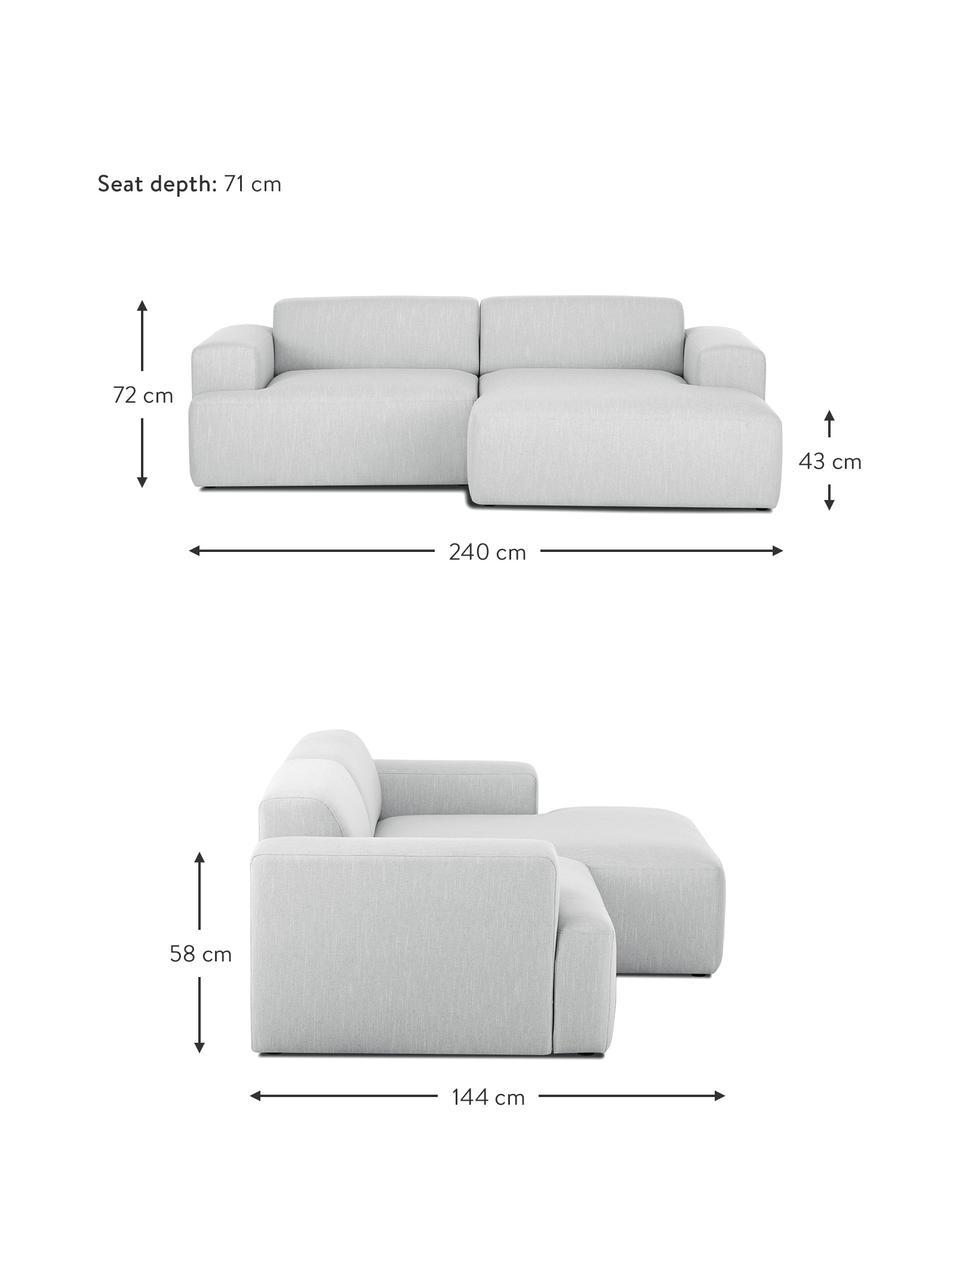 Ecksofa Melva (3-Sitzer) in Hellgrau, Bezug: Polyester Der hochwertige, Gestell: Massives Kiefernholz, Spa, Webstoff Hellgrau, B 240 x T 144 cm